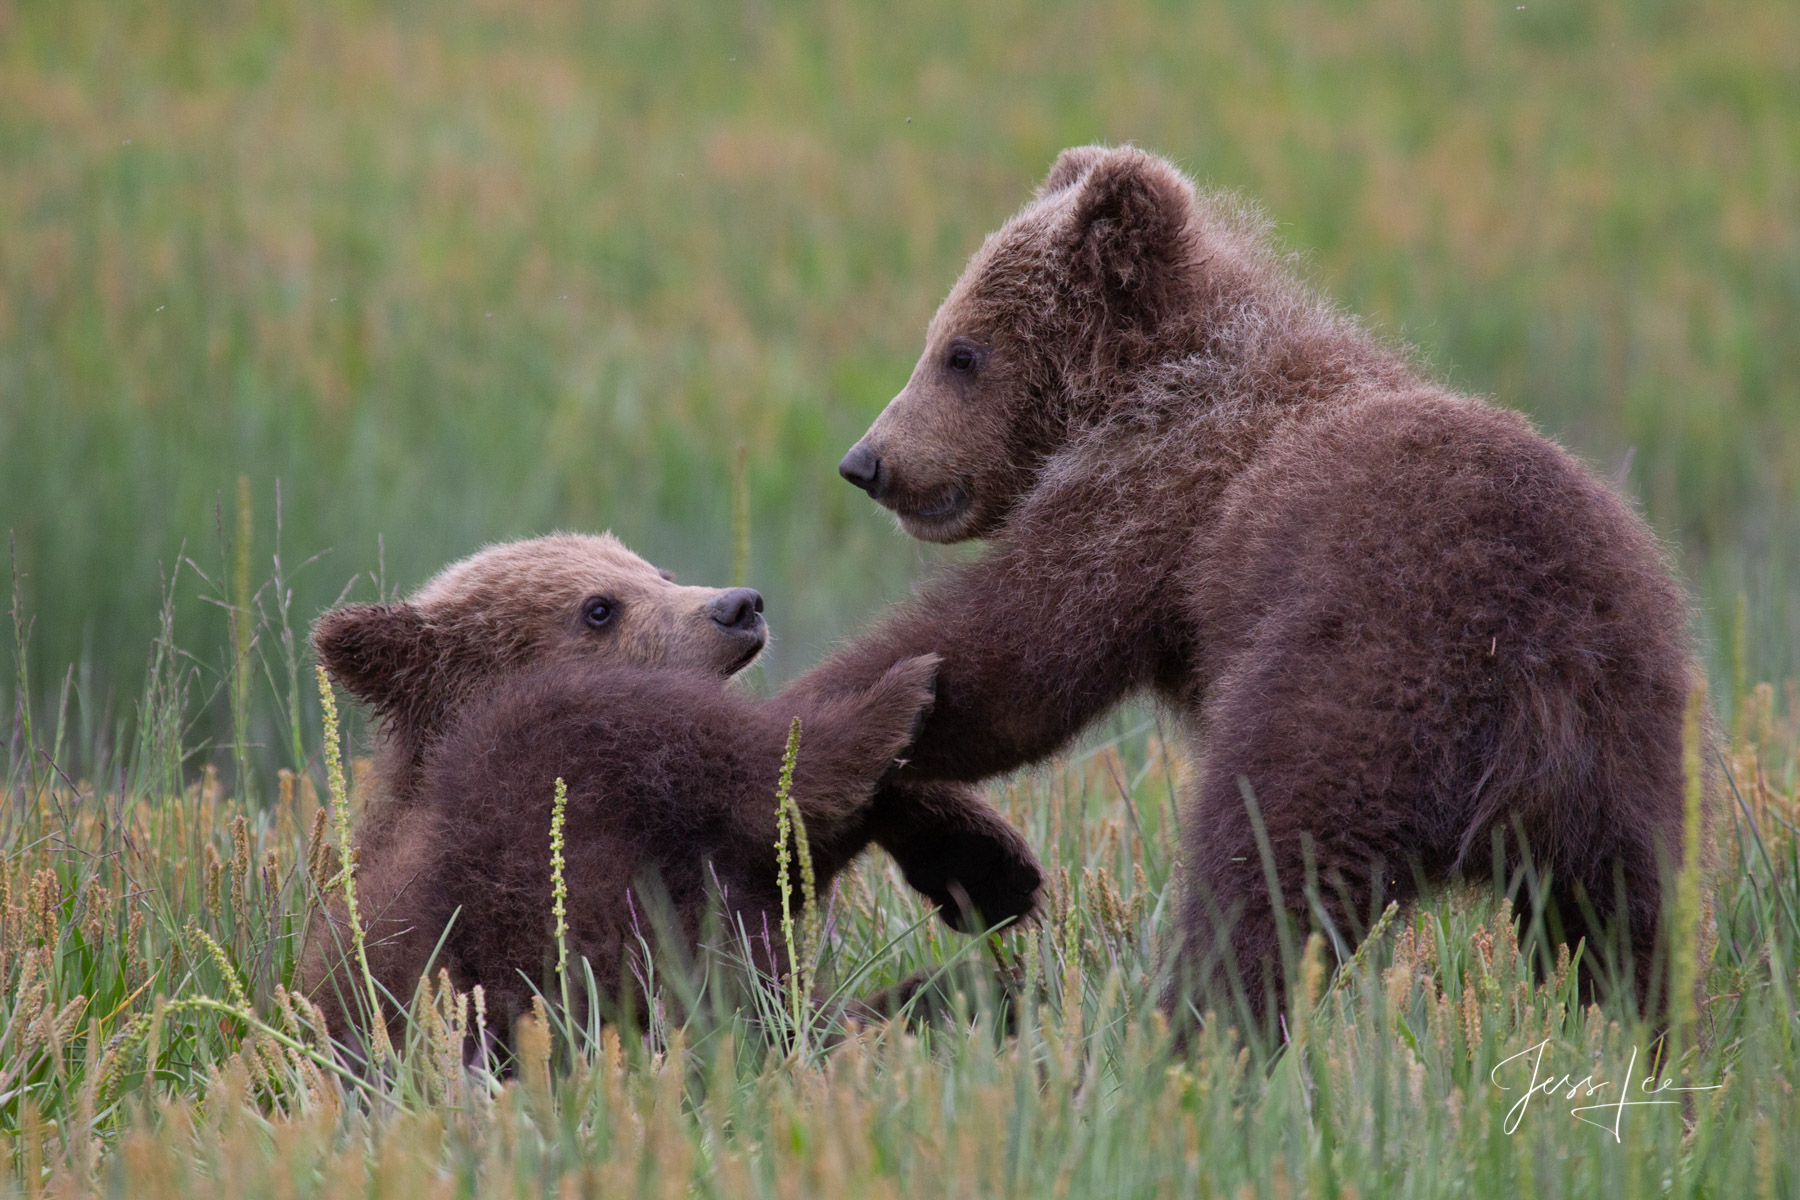 Grizzly, alaska, bear, brown, brown bear, coastal, lake clark, national park, landscape photography, Large format, quality, museum, fine art, print, jess lee, artist, western, cowboy, photographer, li, photo